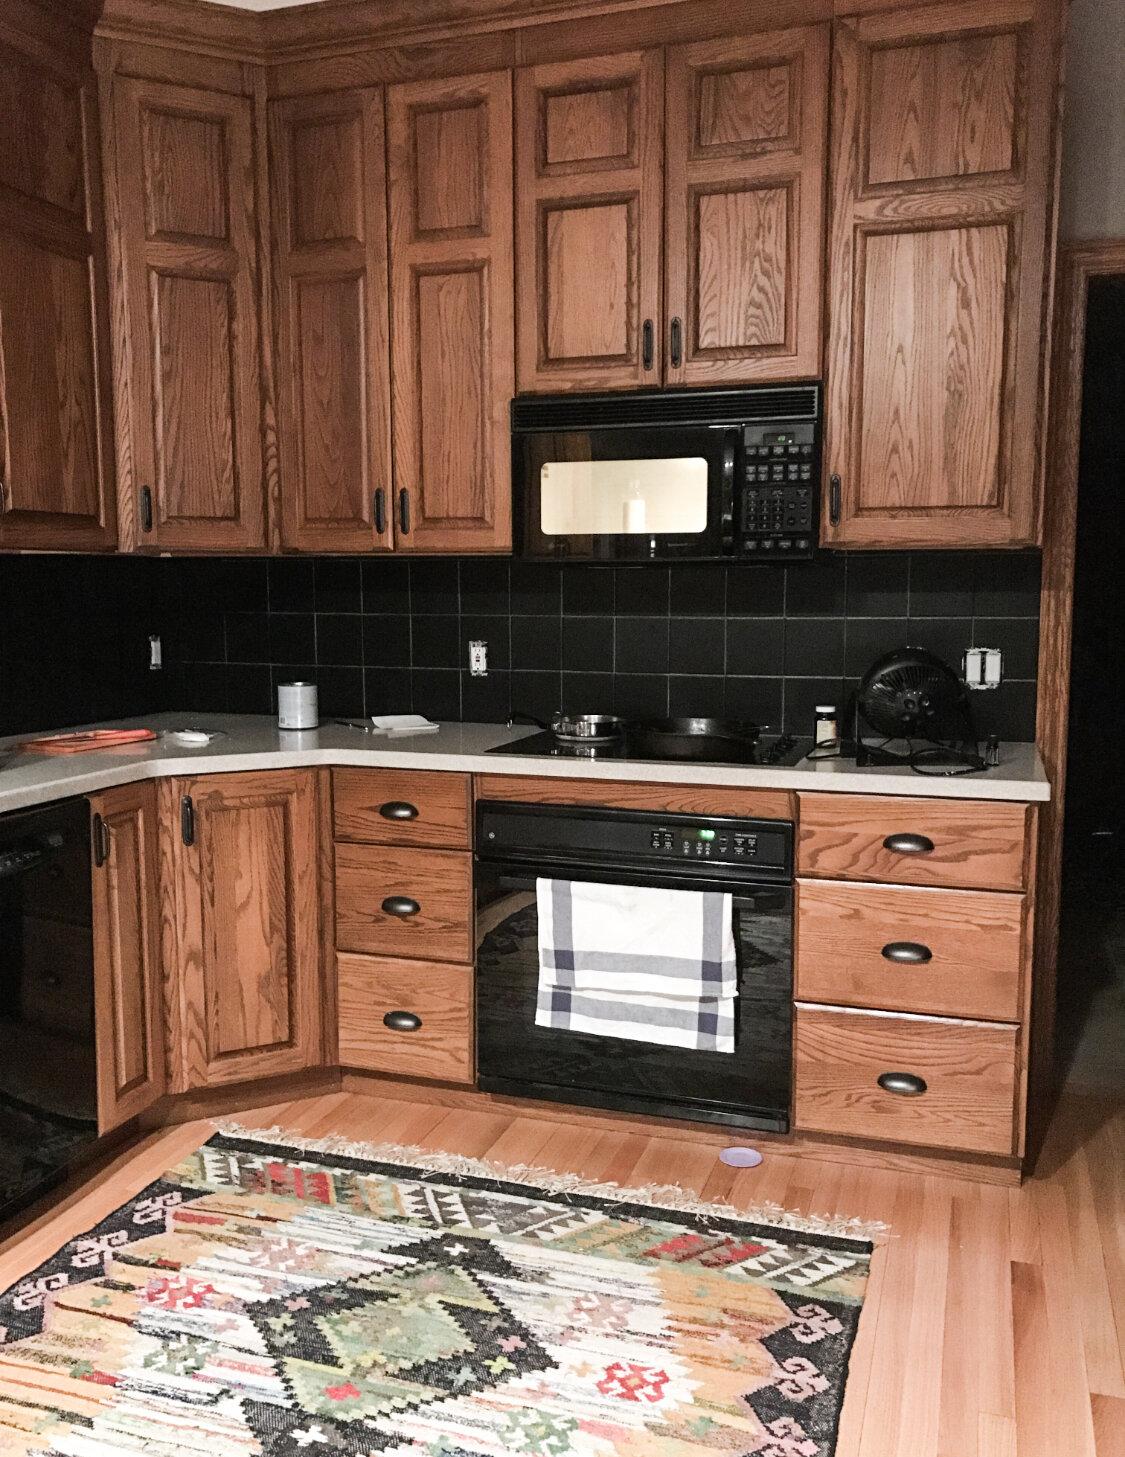 How To Make An Oak Kitchen Cool Again Copper Corners